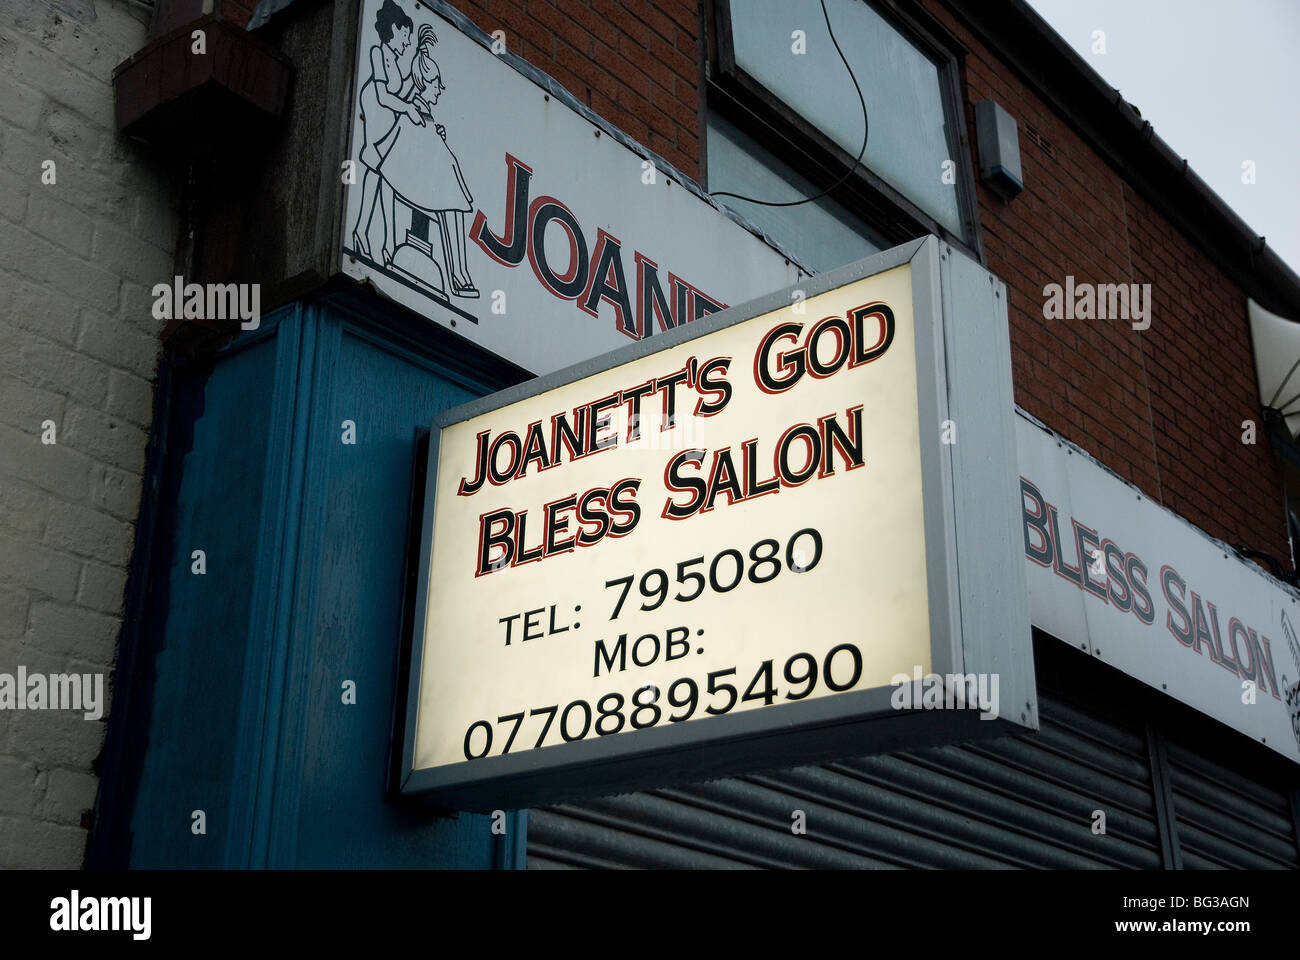 Joanette's God Bless Salon in Preston, Lancashire - Stock Image